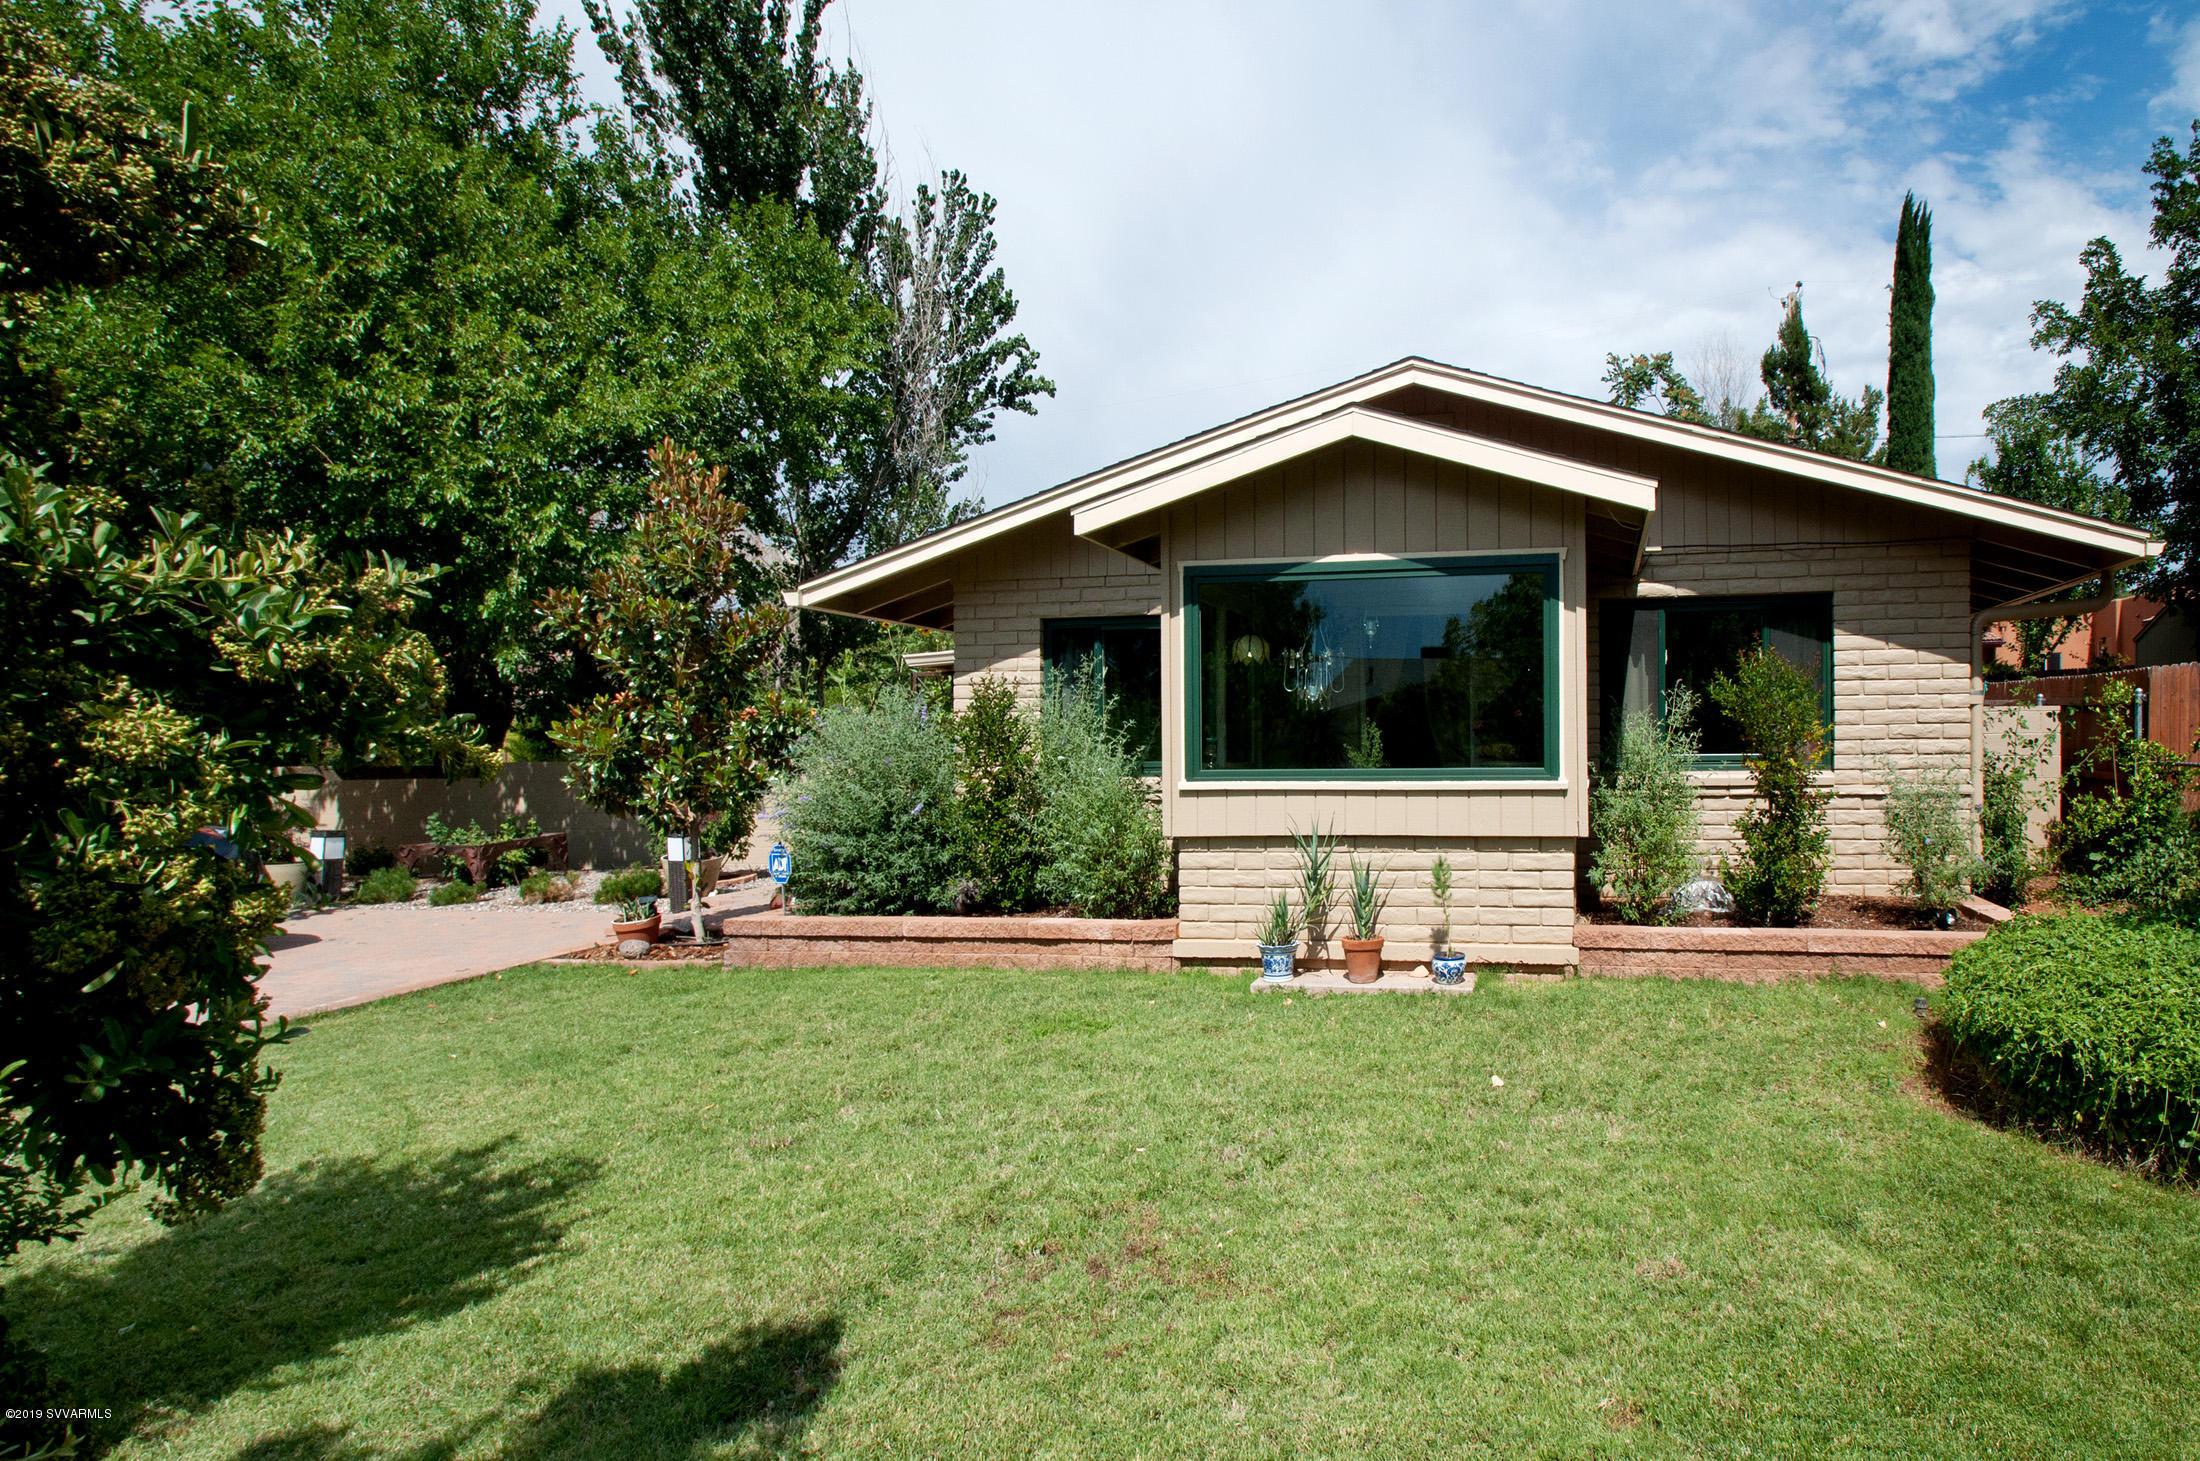 270 View Drive Sedona, AZ 86336